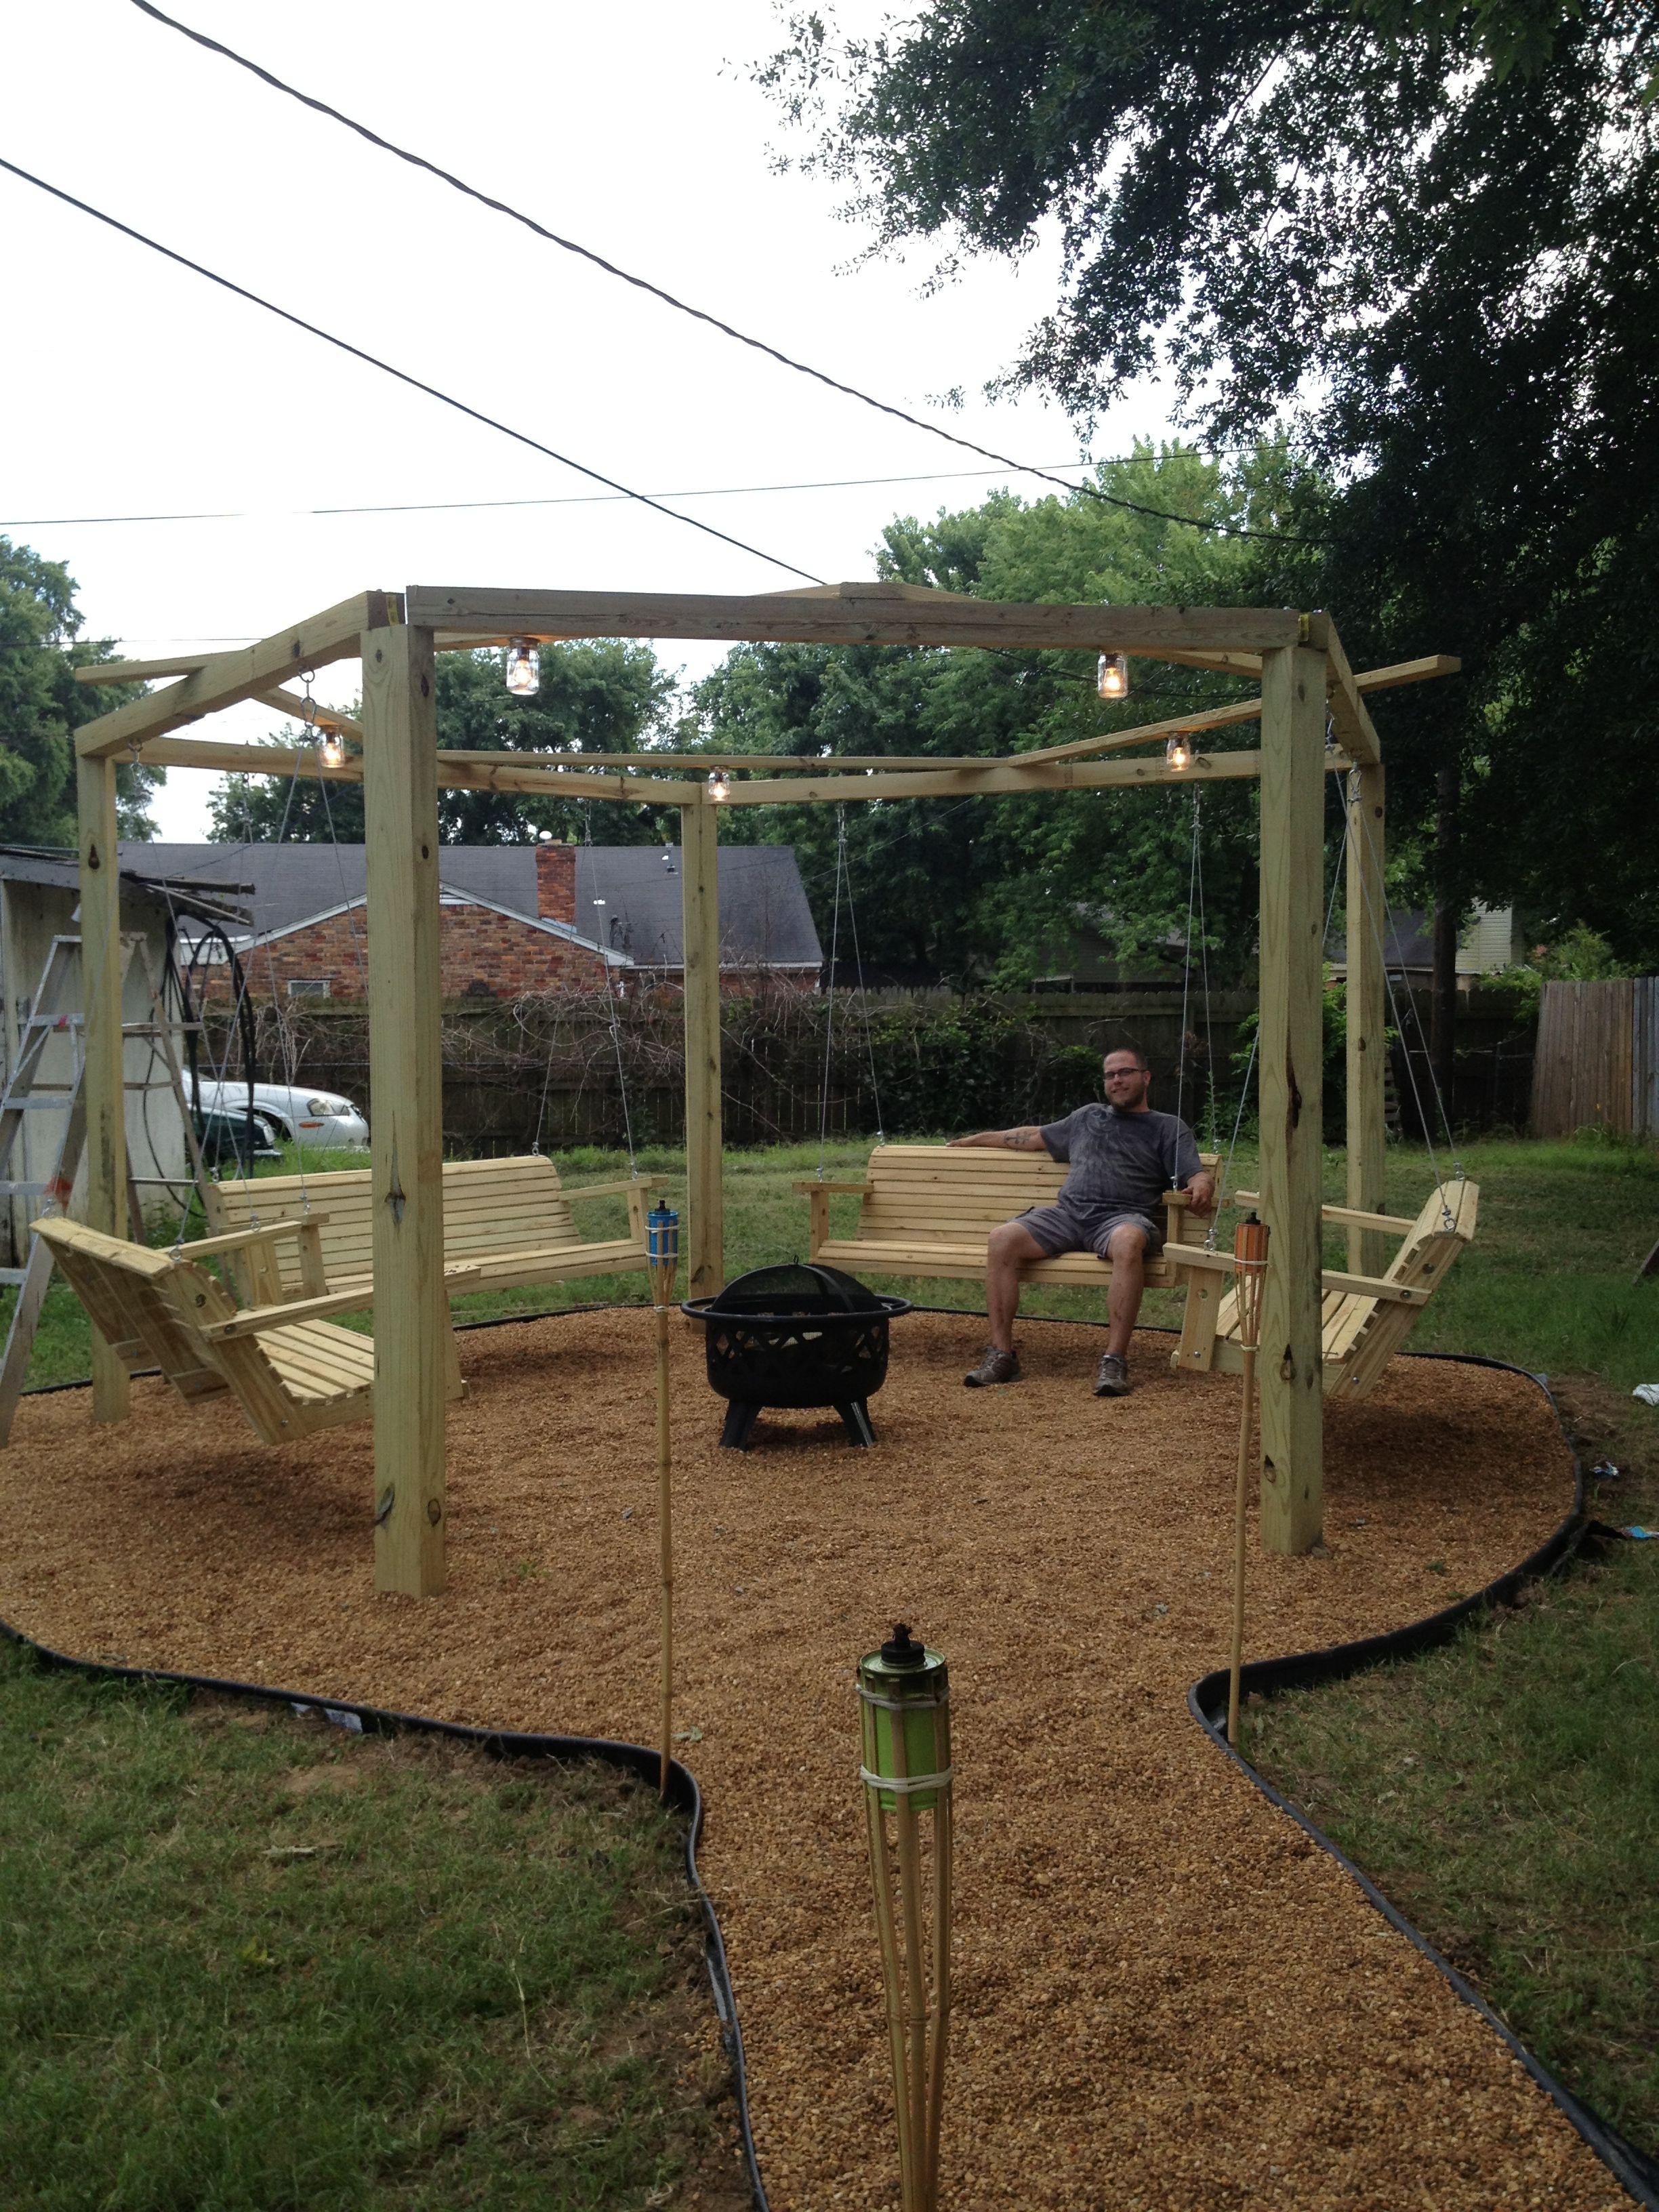 Diy Fire Pit Swing Set Home Design Garden Architecture